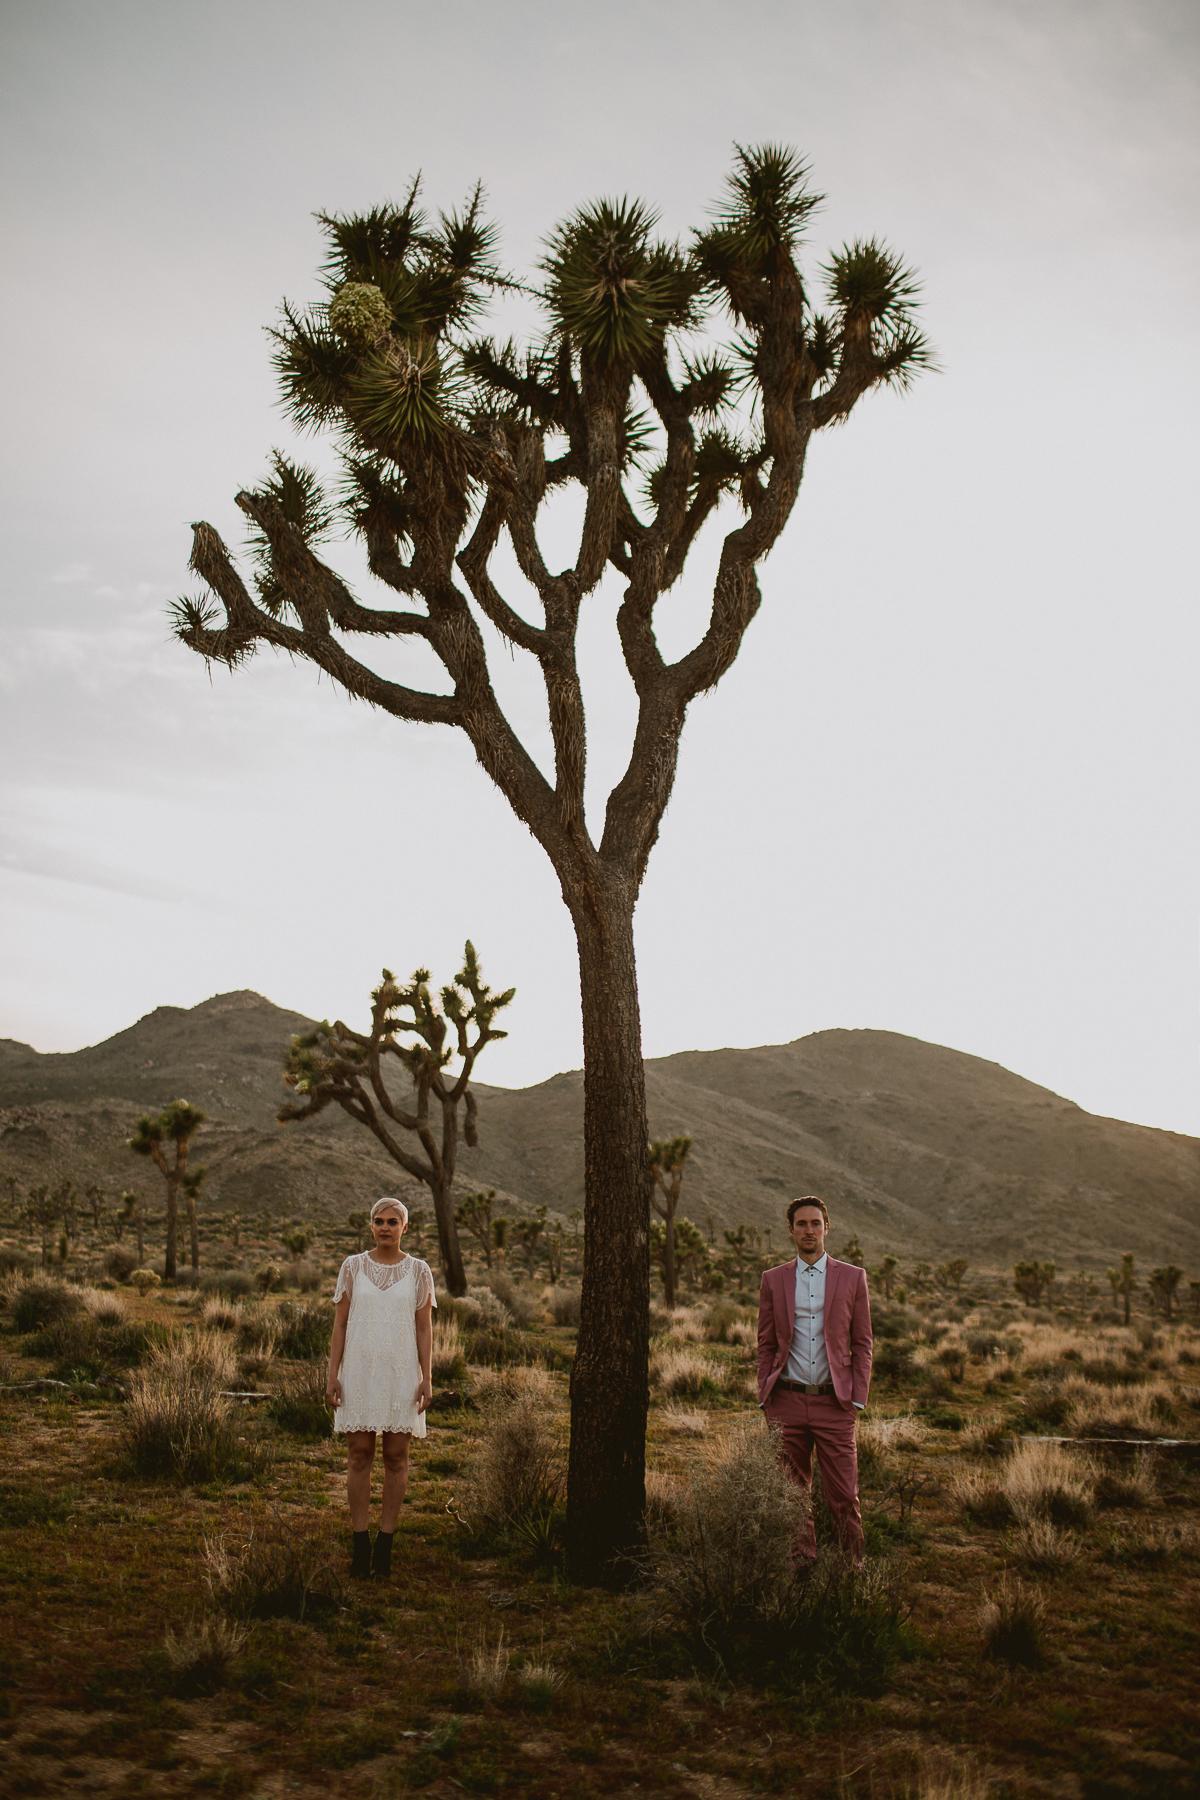 joshua-tree-national-park-engagement-kelley-raye-los-angeles-wedding-photographer-123.jpg